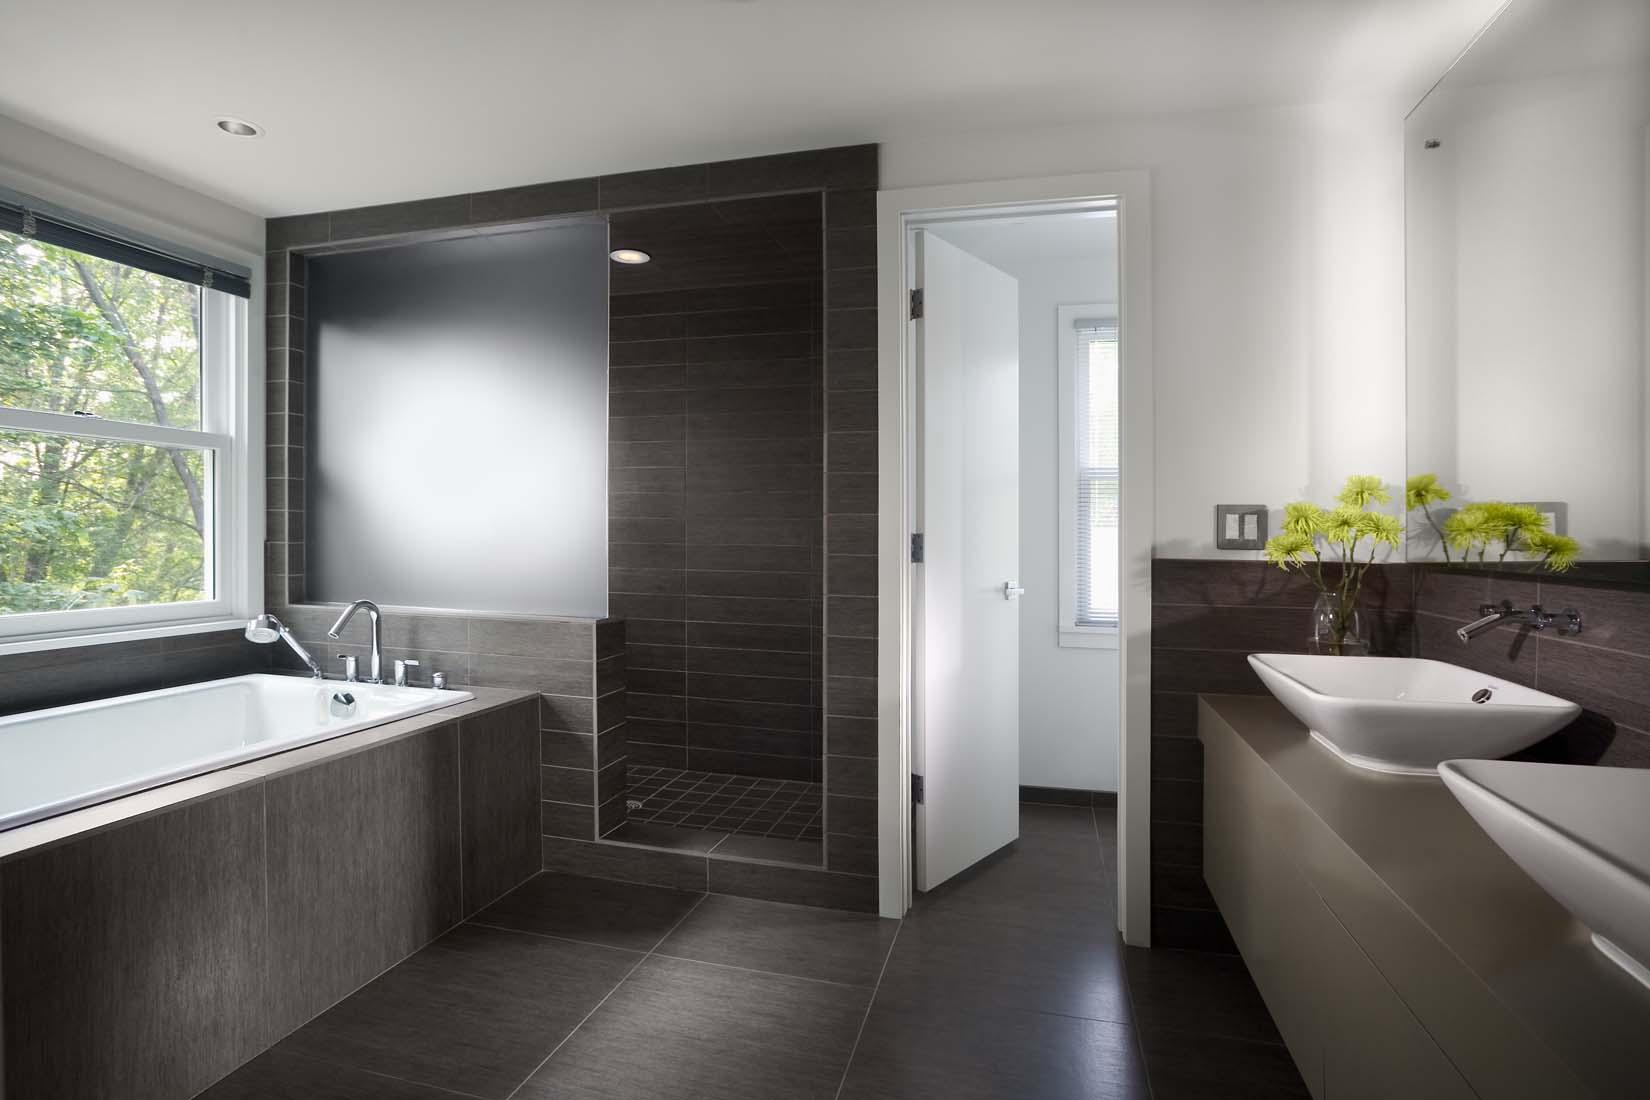 Modern Bathroom With Gray Tiled Floor Platform Tub And Walk In Shower